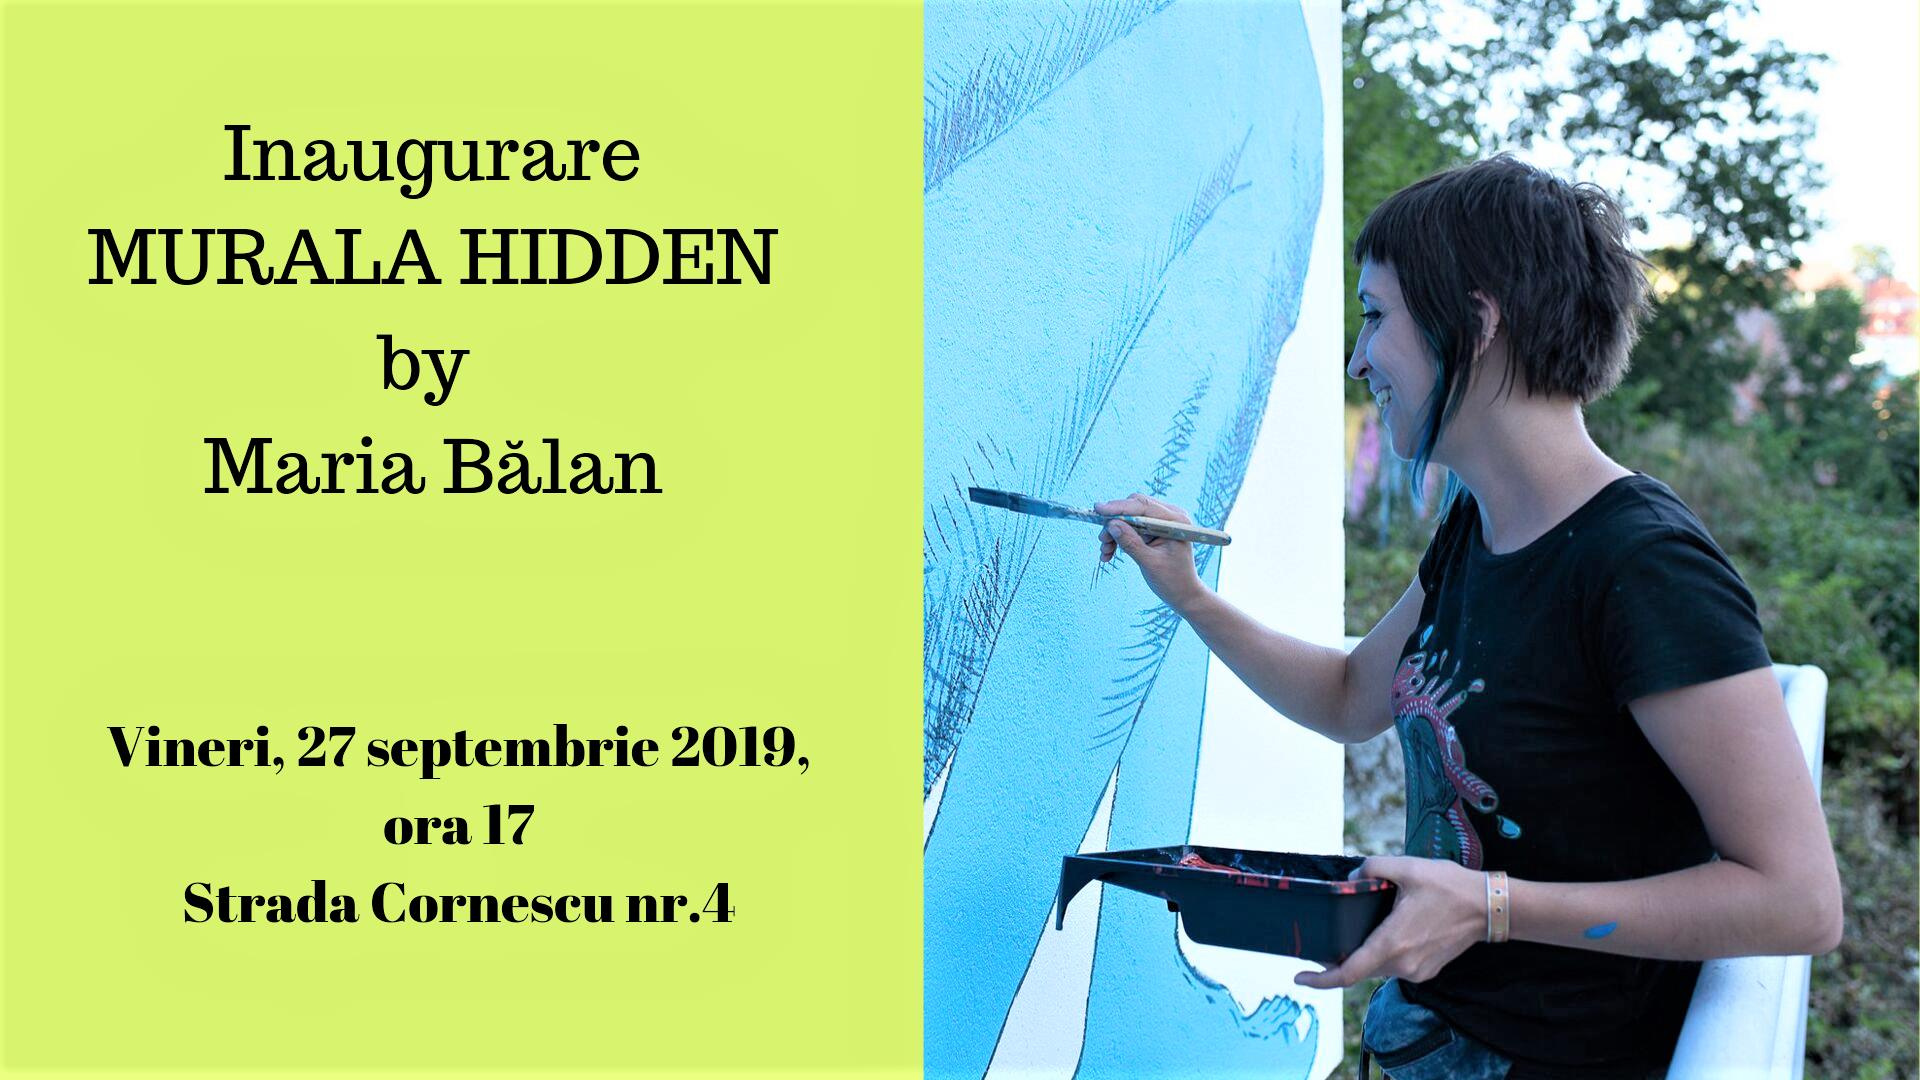 Inaugurare murală Hidden by Maria Bălan